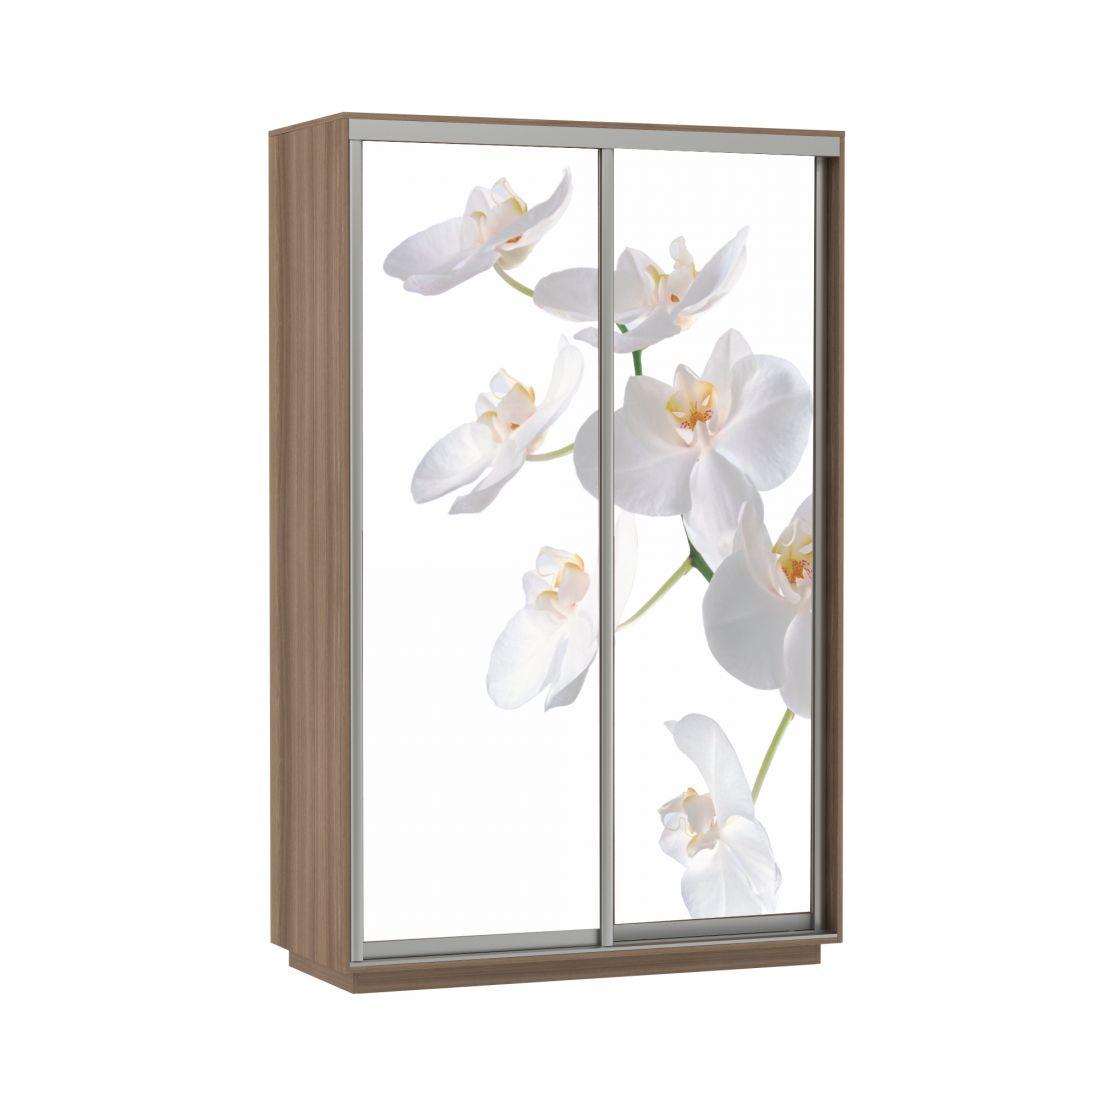 Шкаф-купе Дуо Фото Орхидея